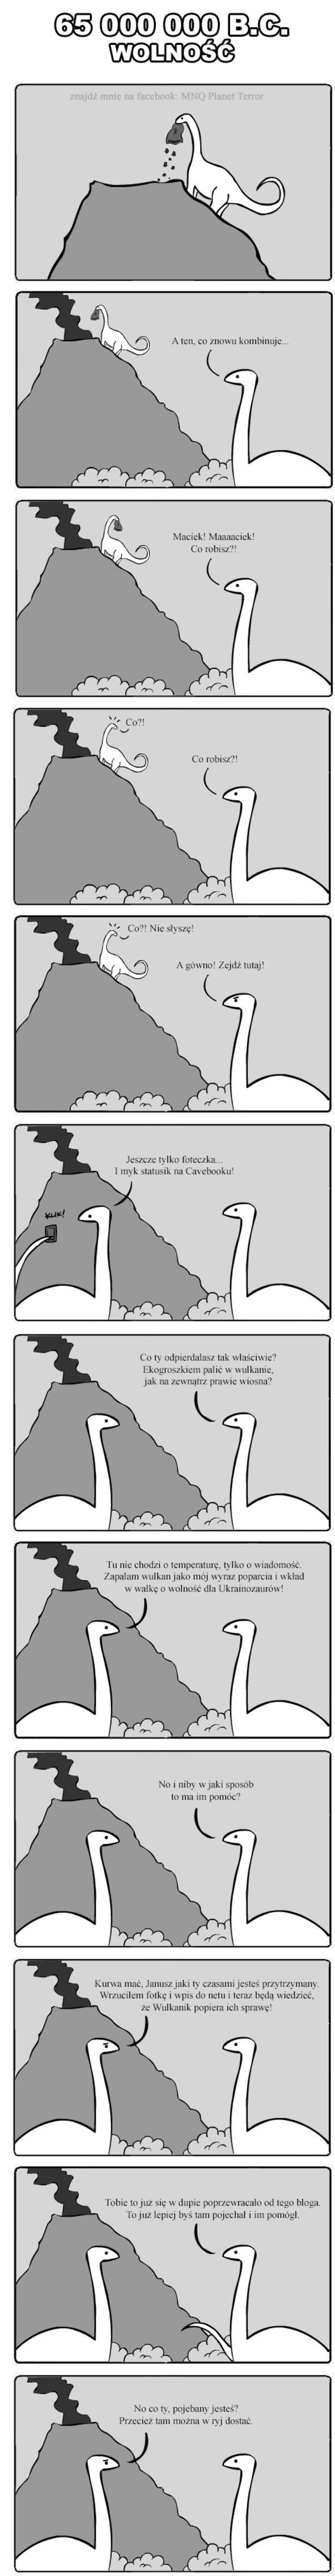 Pomoc dla Ukrainozaurów